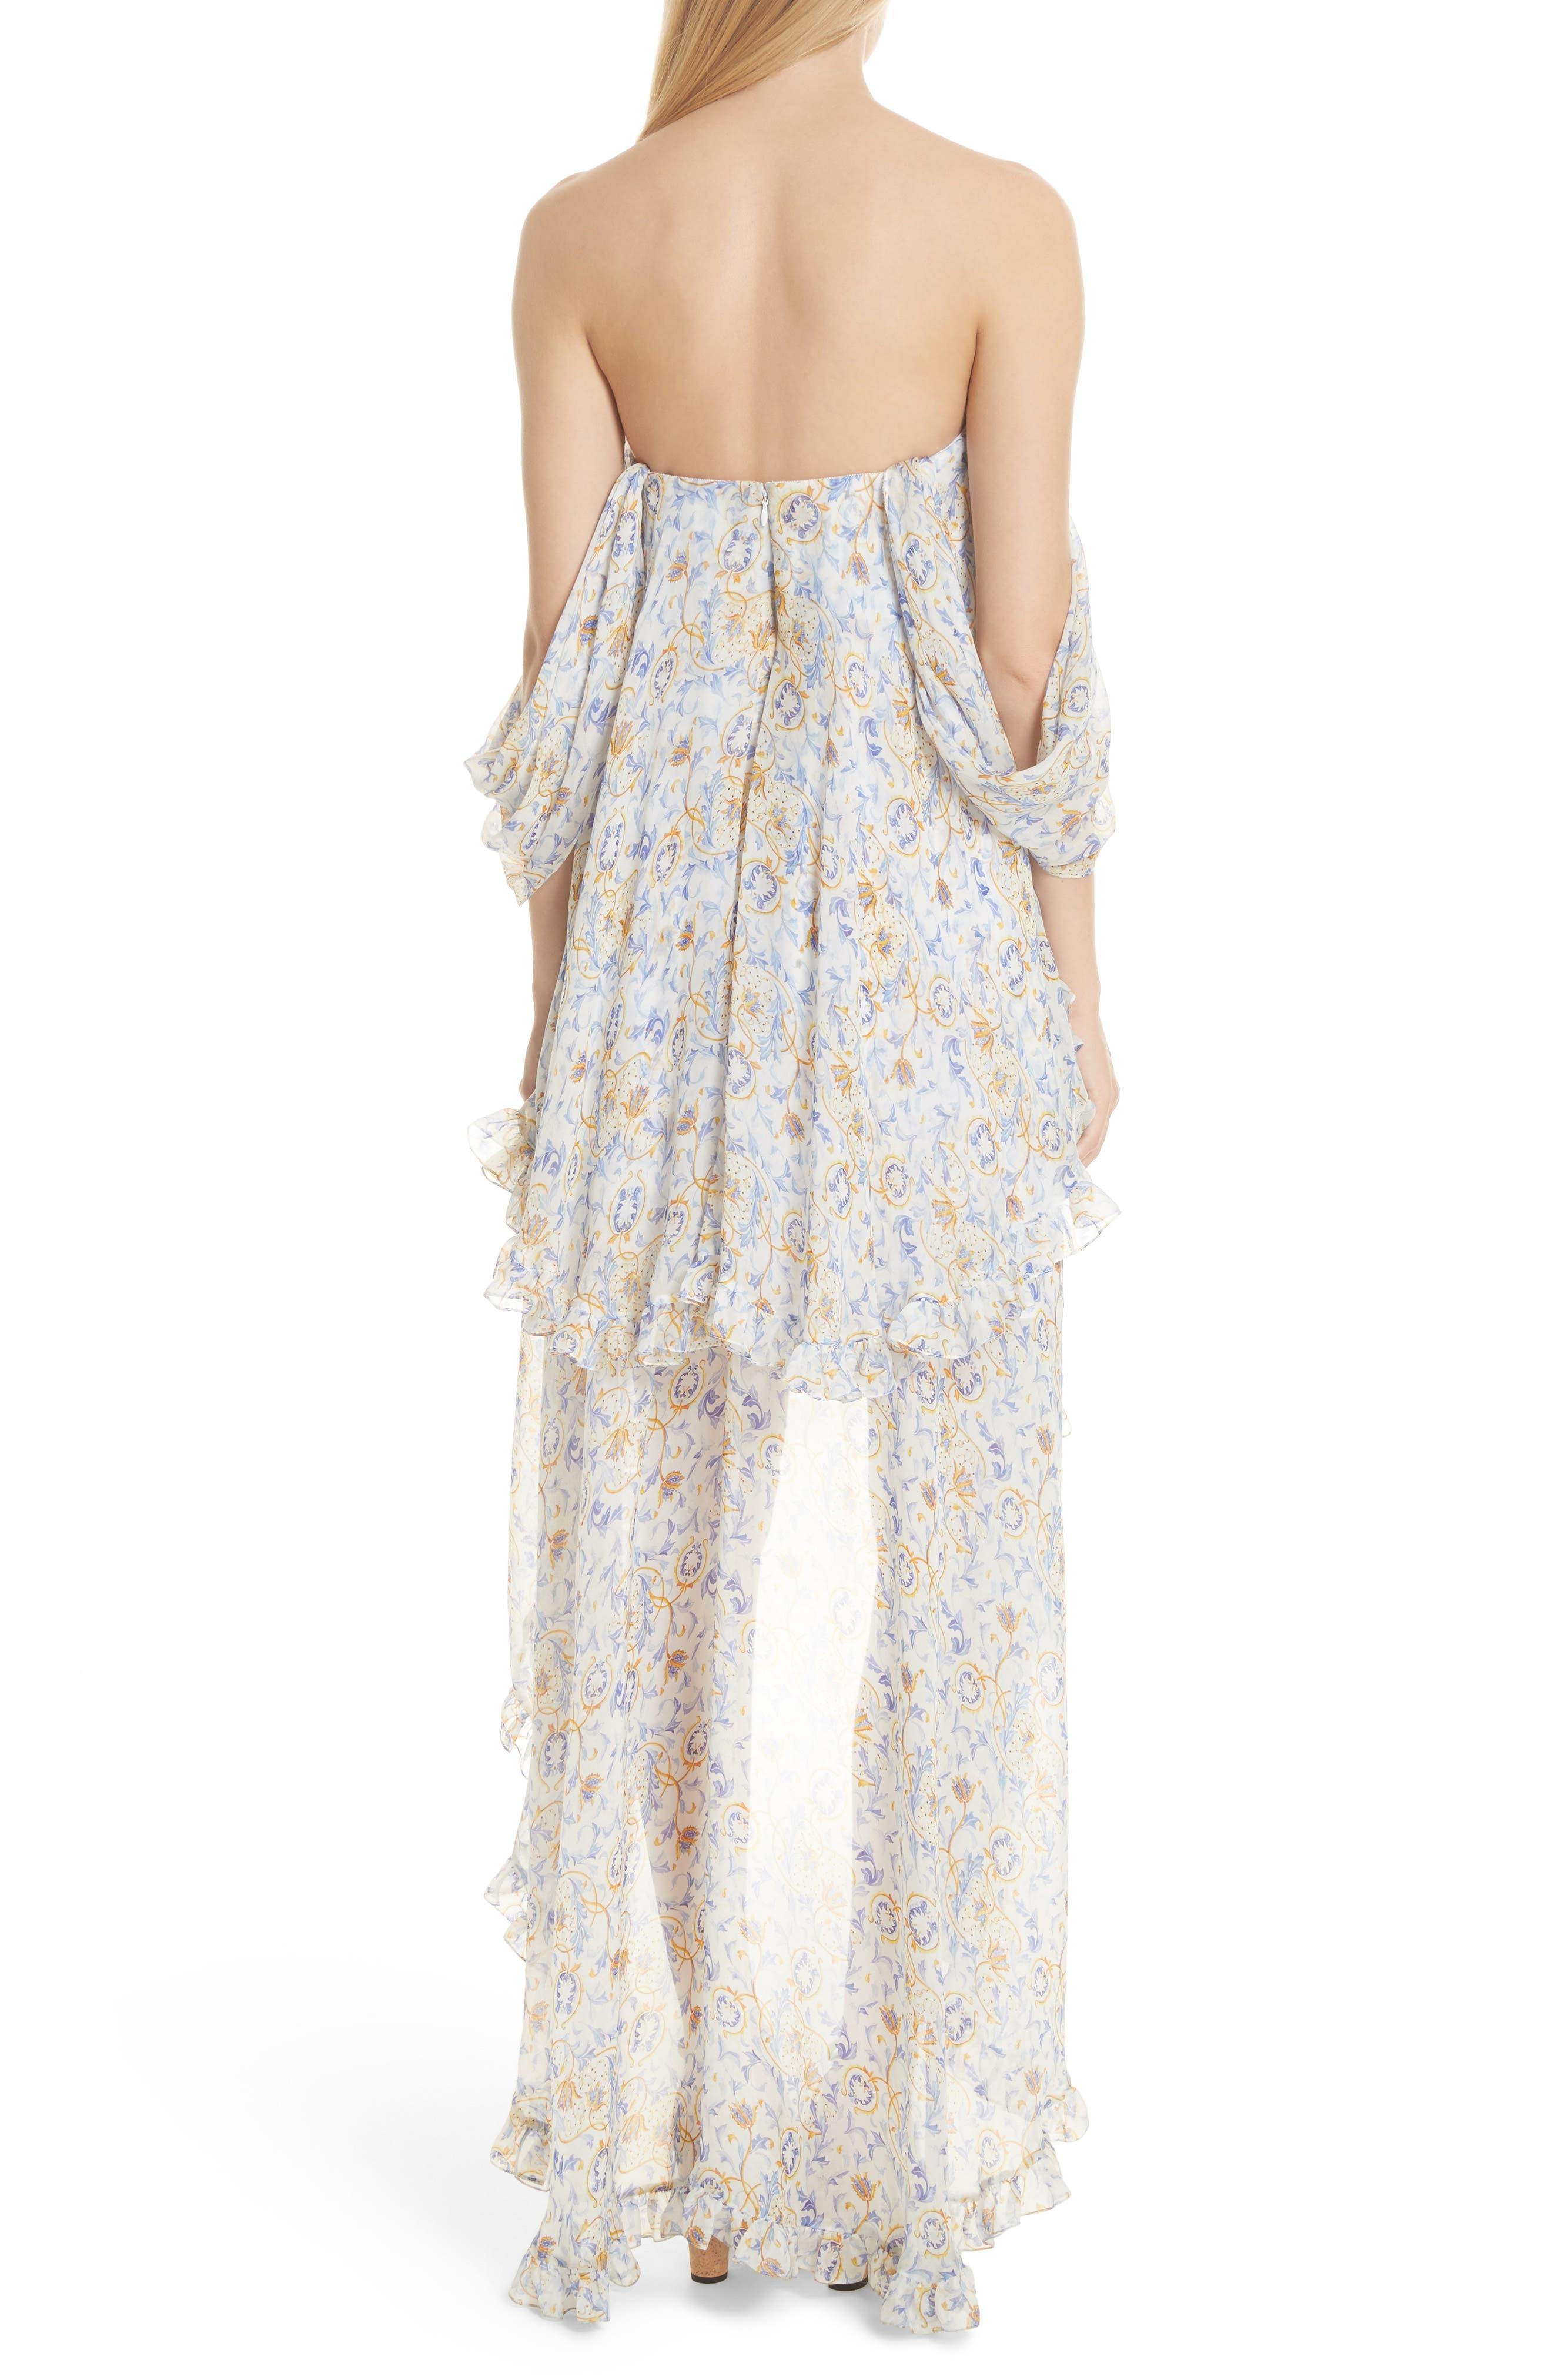 Melina Off the Shoulder High/Low Dress,                             Alternate thumbnail 3, color,                             Blue